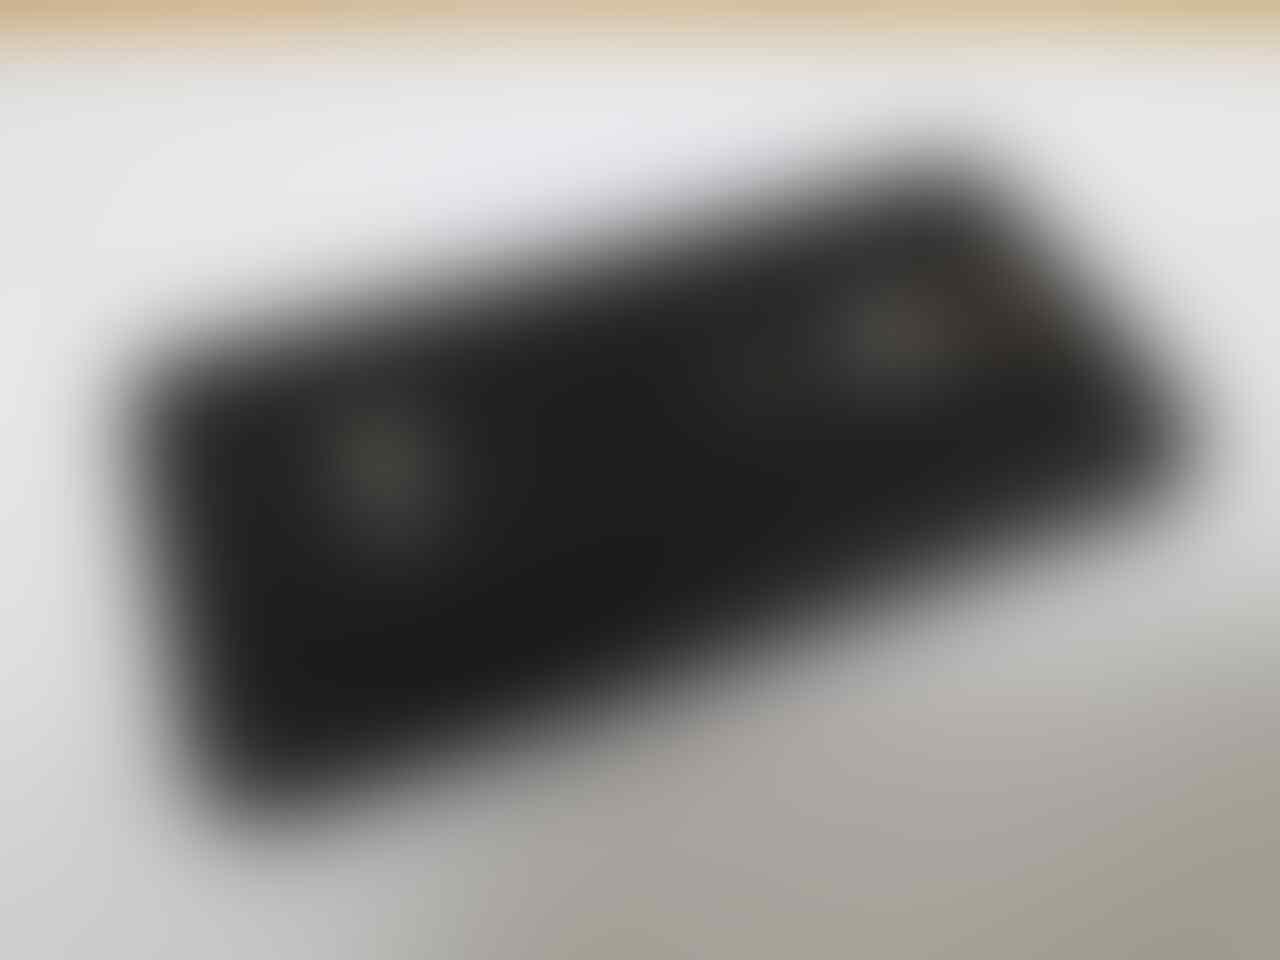 "LG Optimus LTE LU6200 Black | DualCore 1.5GHz, RAM1GB, True HD LCD 4.5"", JellyBean OS"